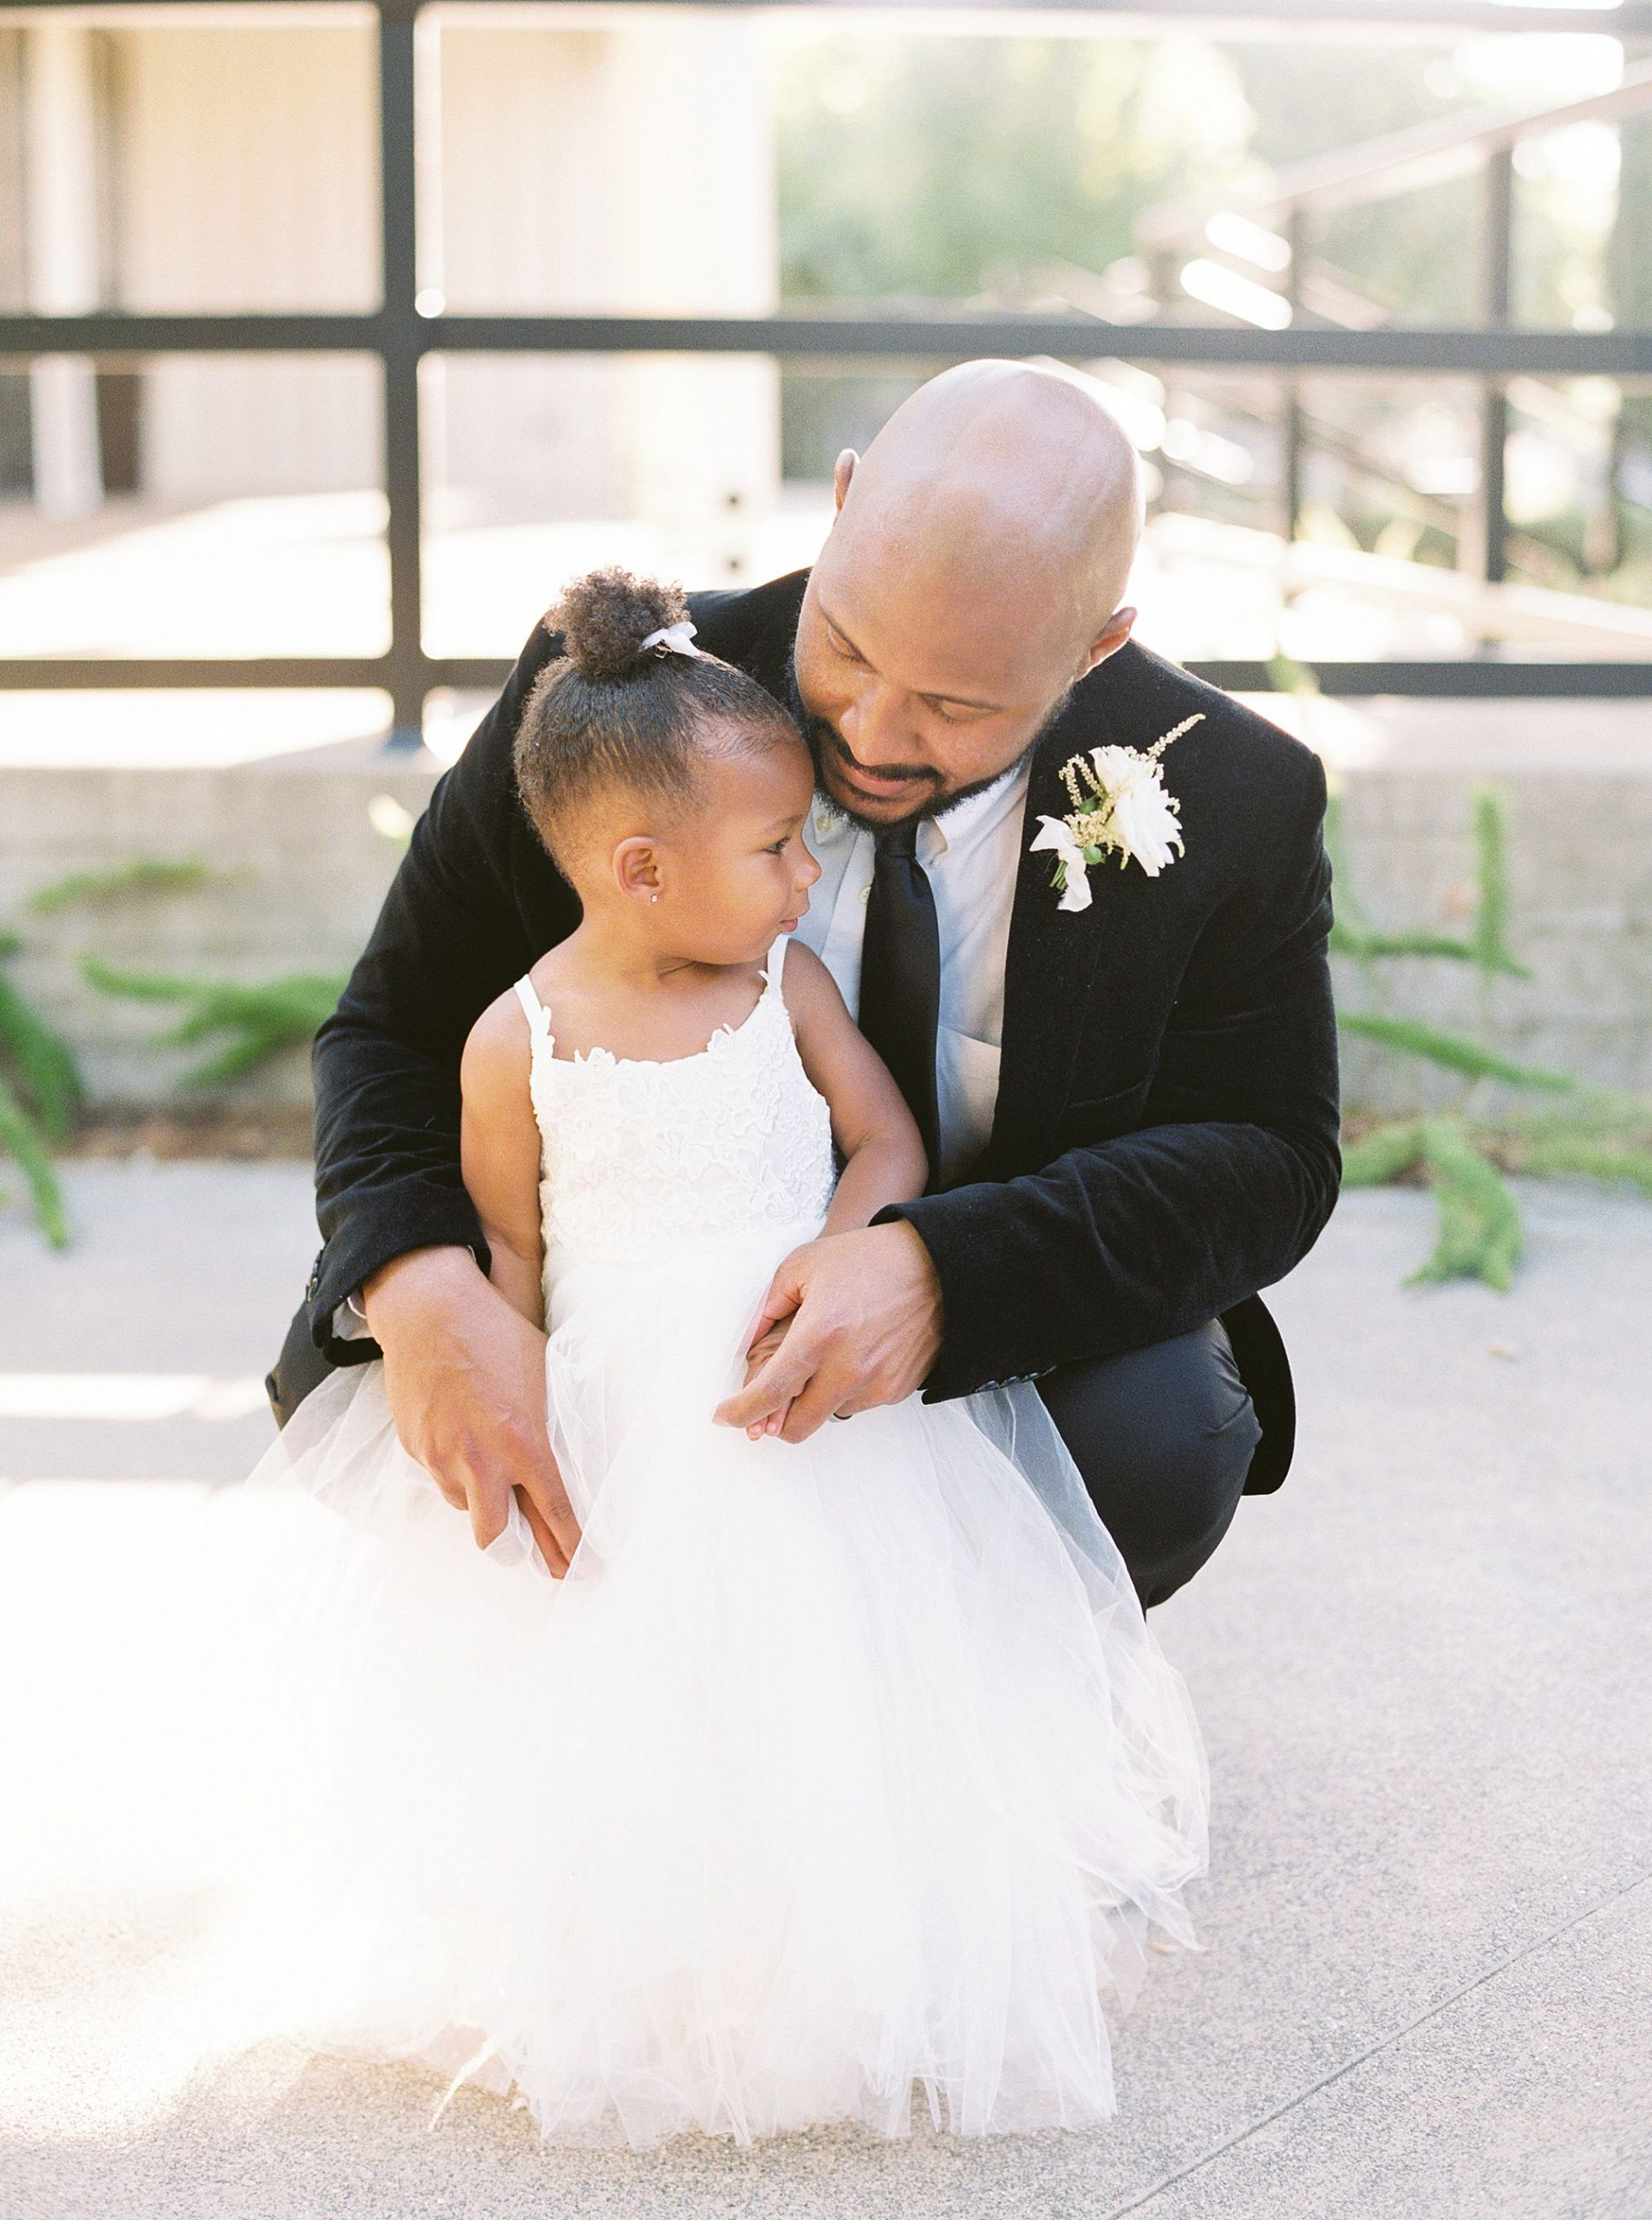 Park Winters Micro-Wedding Inspiration on Style Me Pretty - Stephanie Teague Events - Ashley Baumgartner - Park Winters Wedding - Black Tie Wedding - Micro-Wedding Sacramento Photographer_0064.jpg